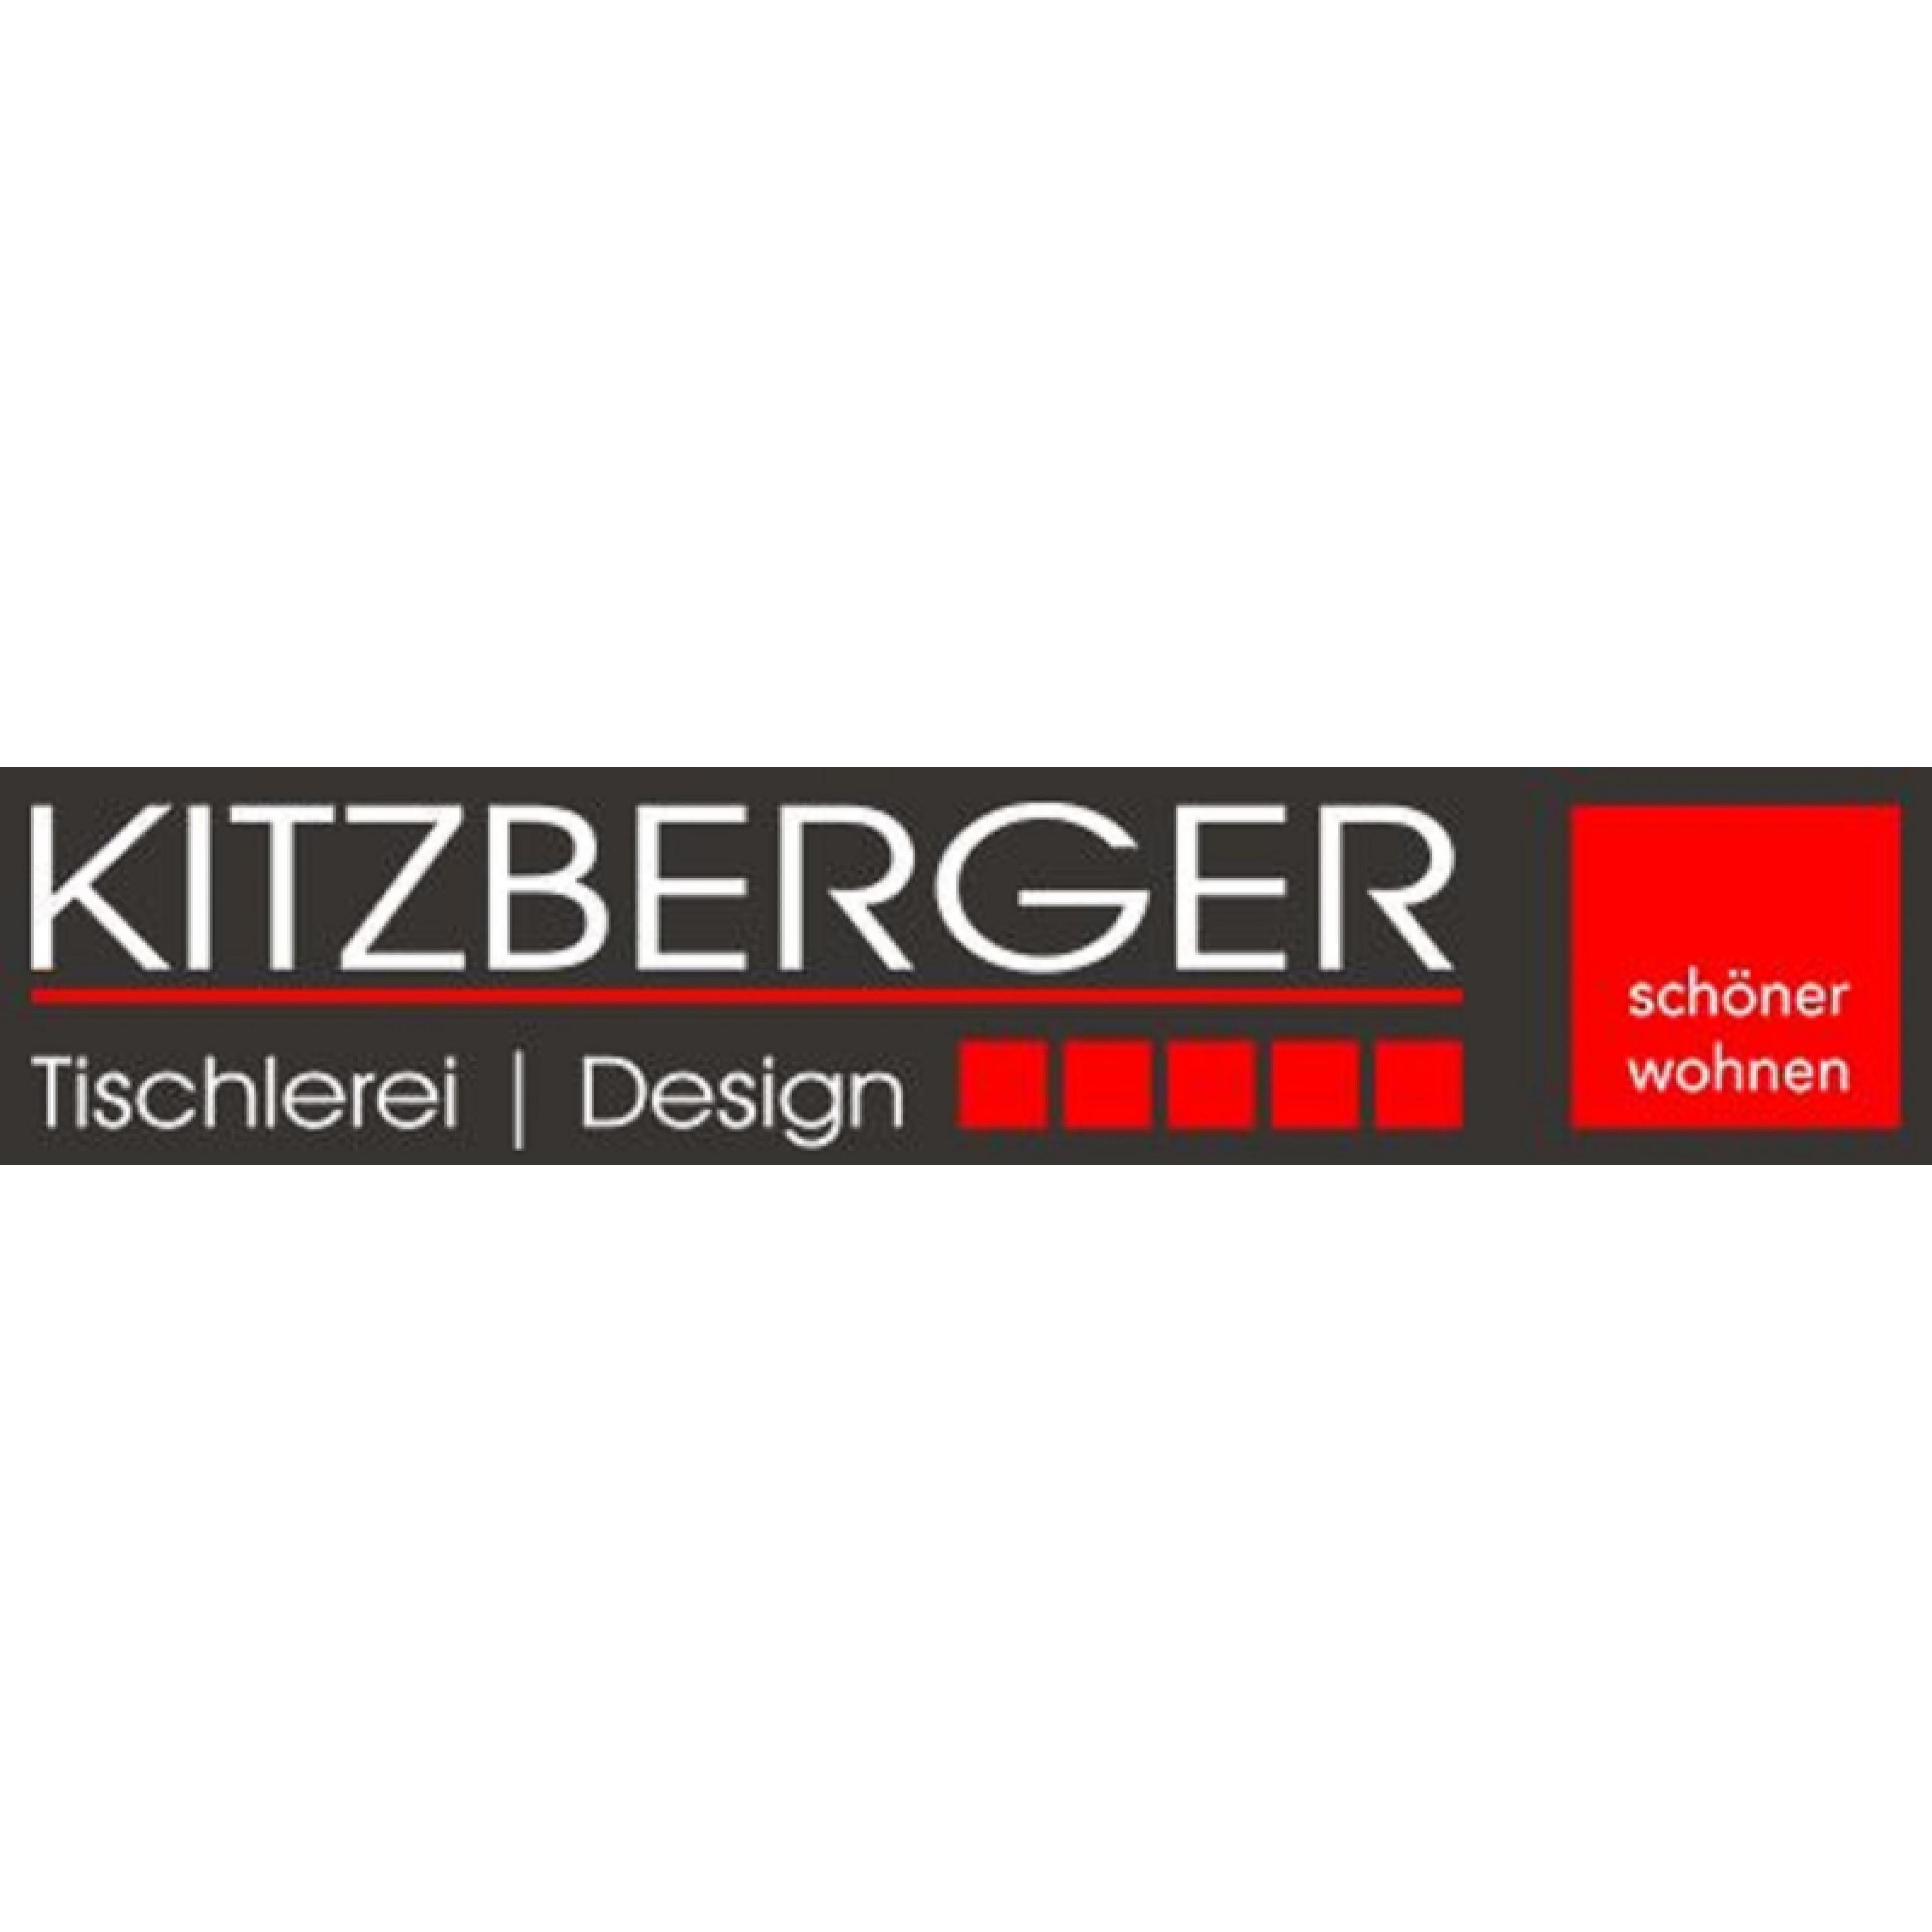 Kitzberger Tischlerei u. Design